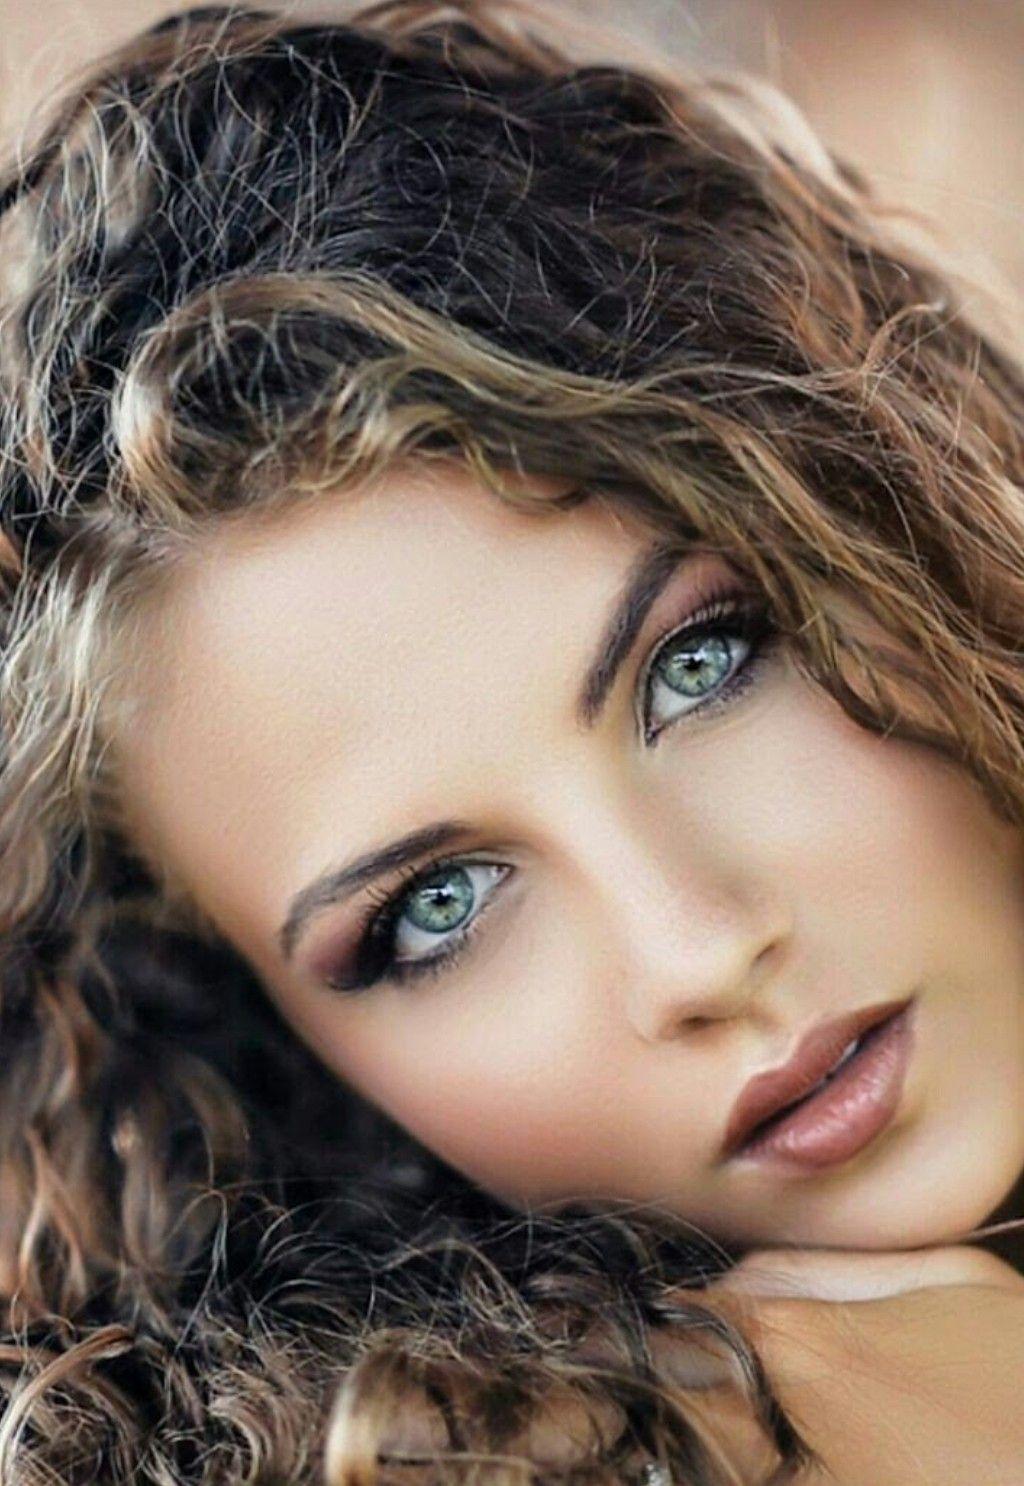 Ts Stunning Eyes Beautiful Women Faces Lovely Eyes